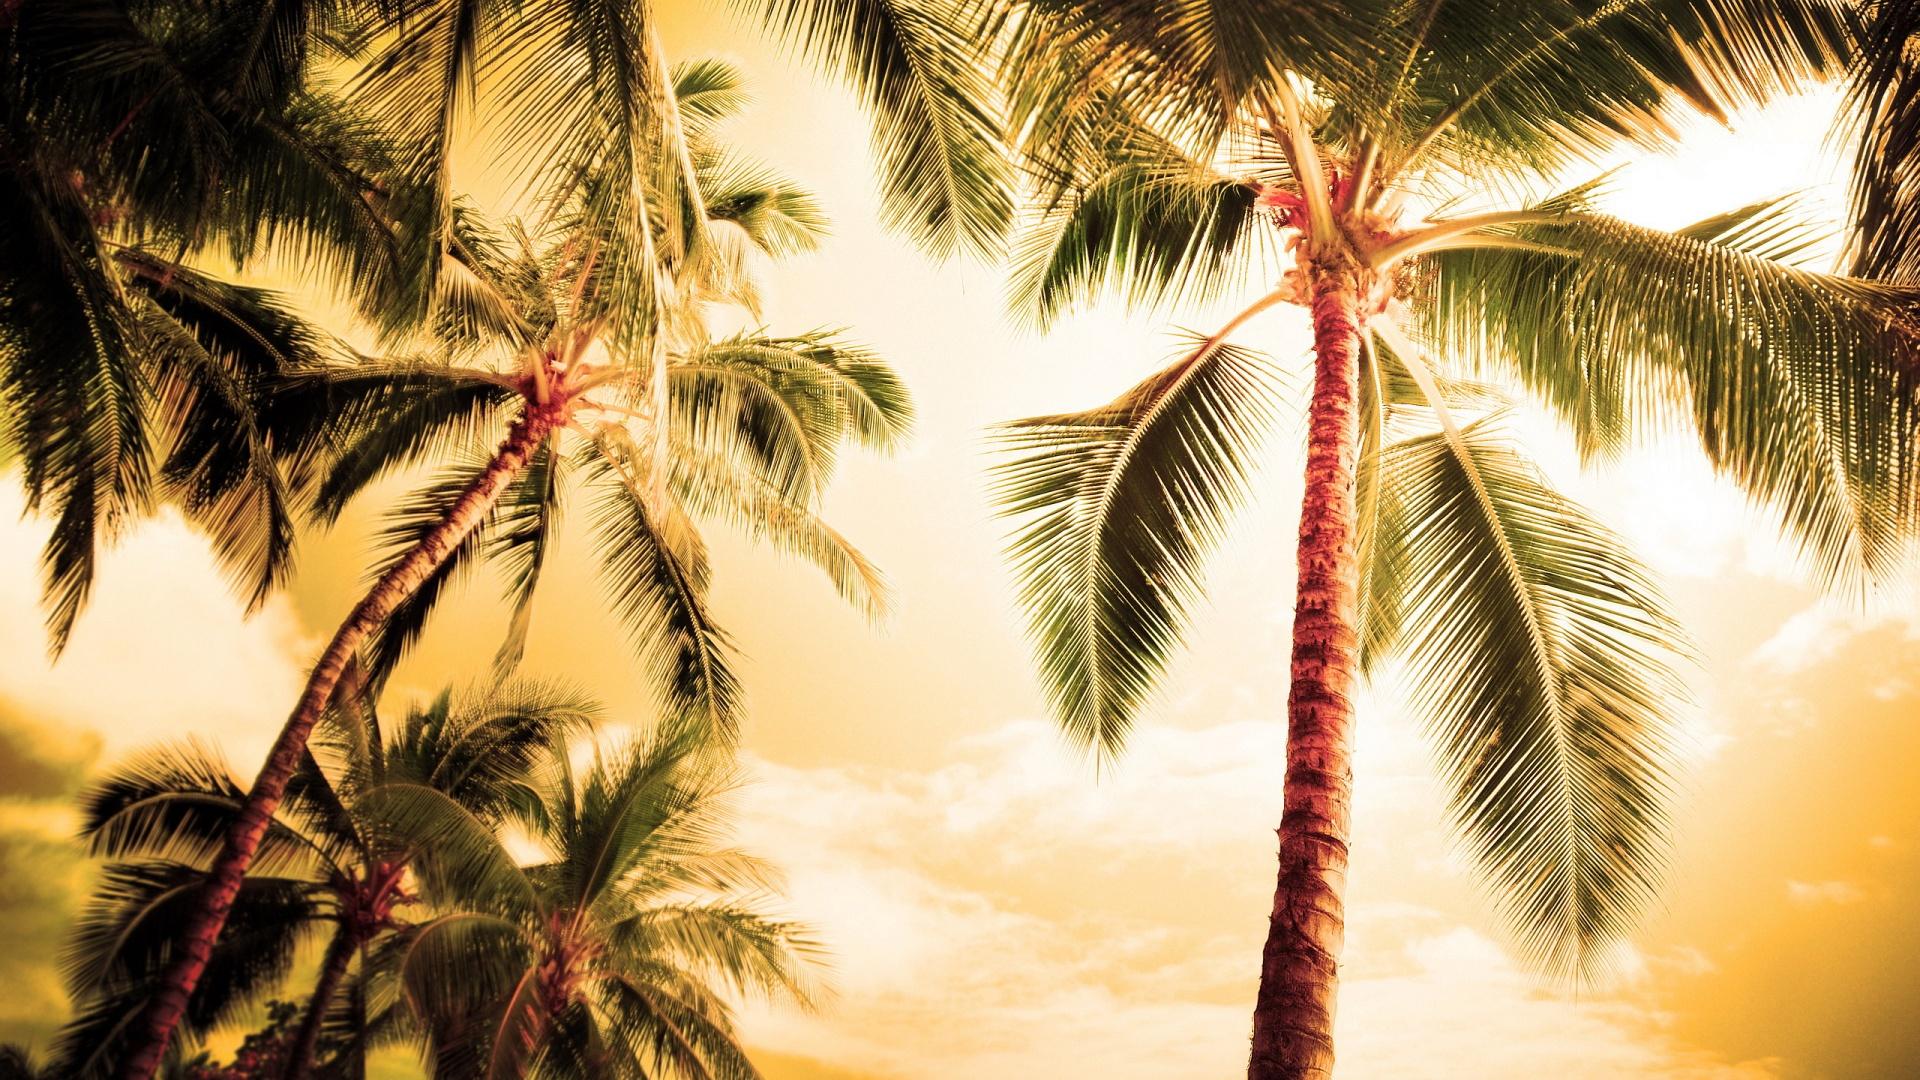 Palm Tree Wallpaper